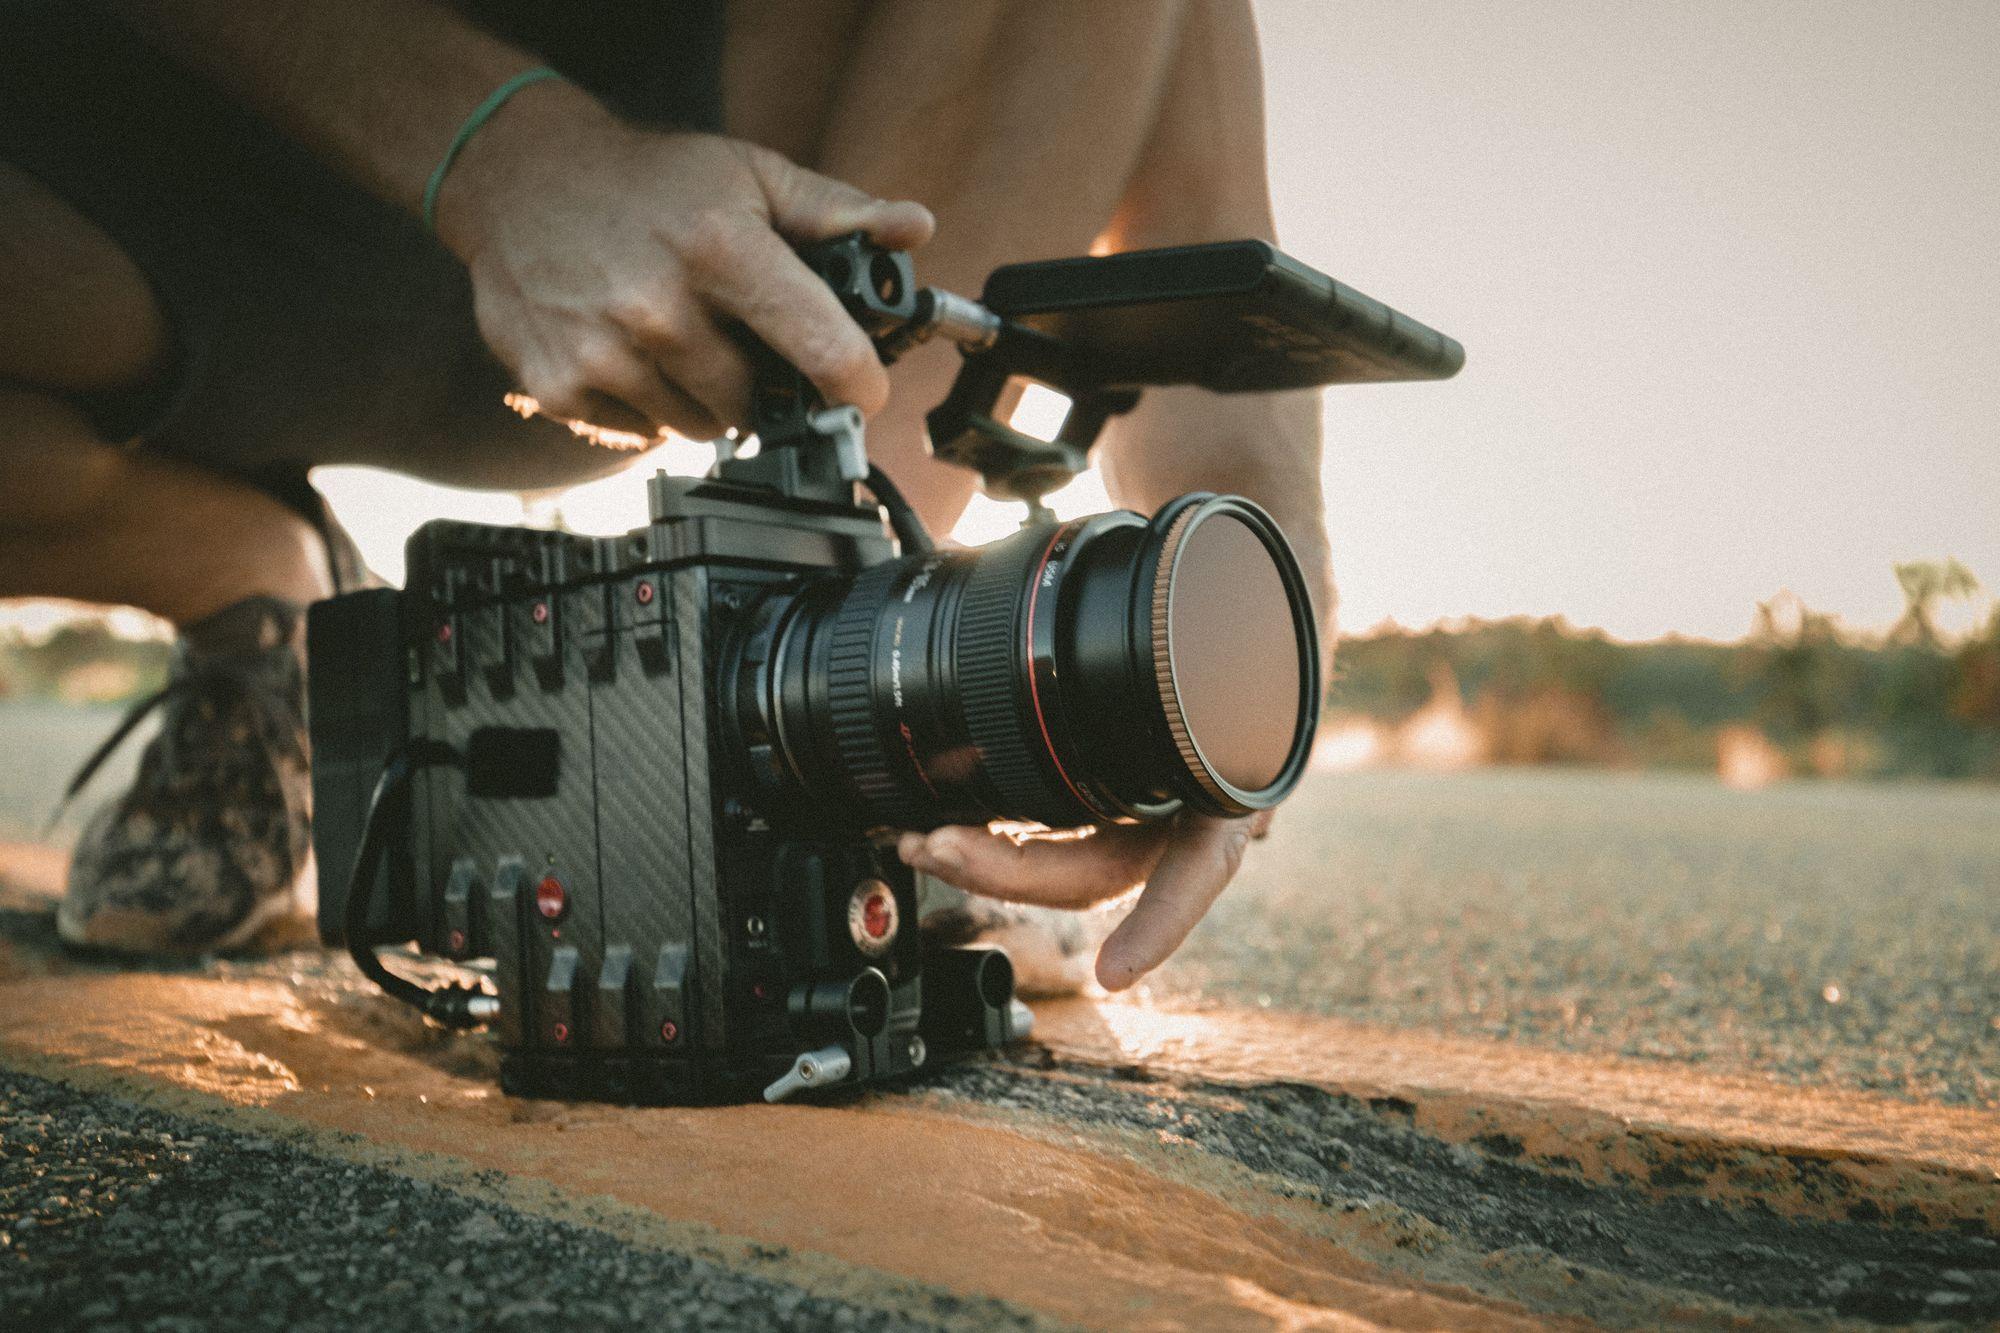 travel-camera-on-road